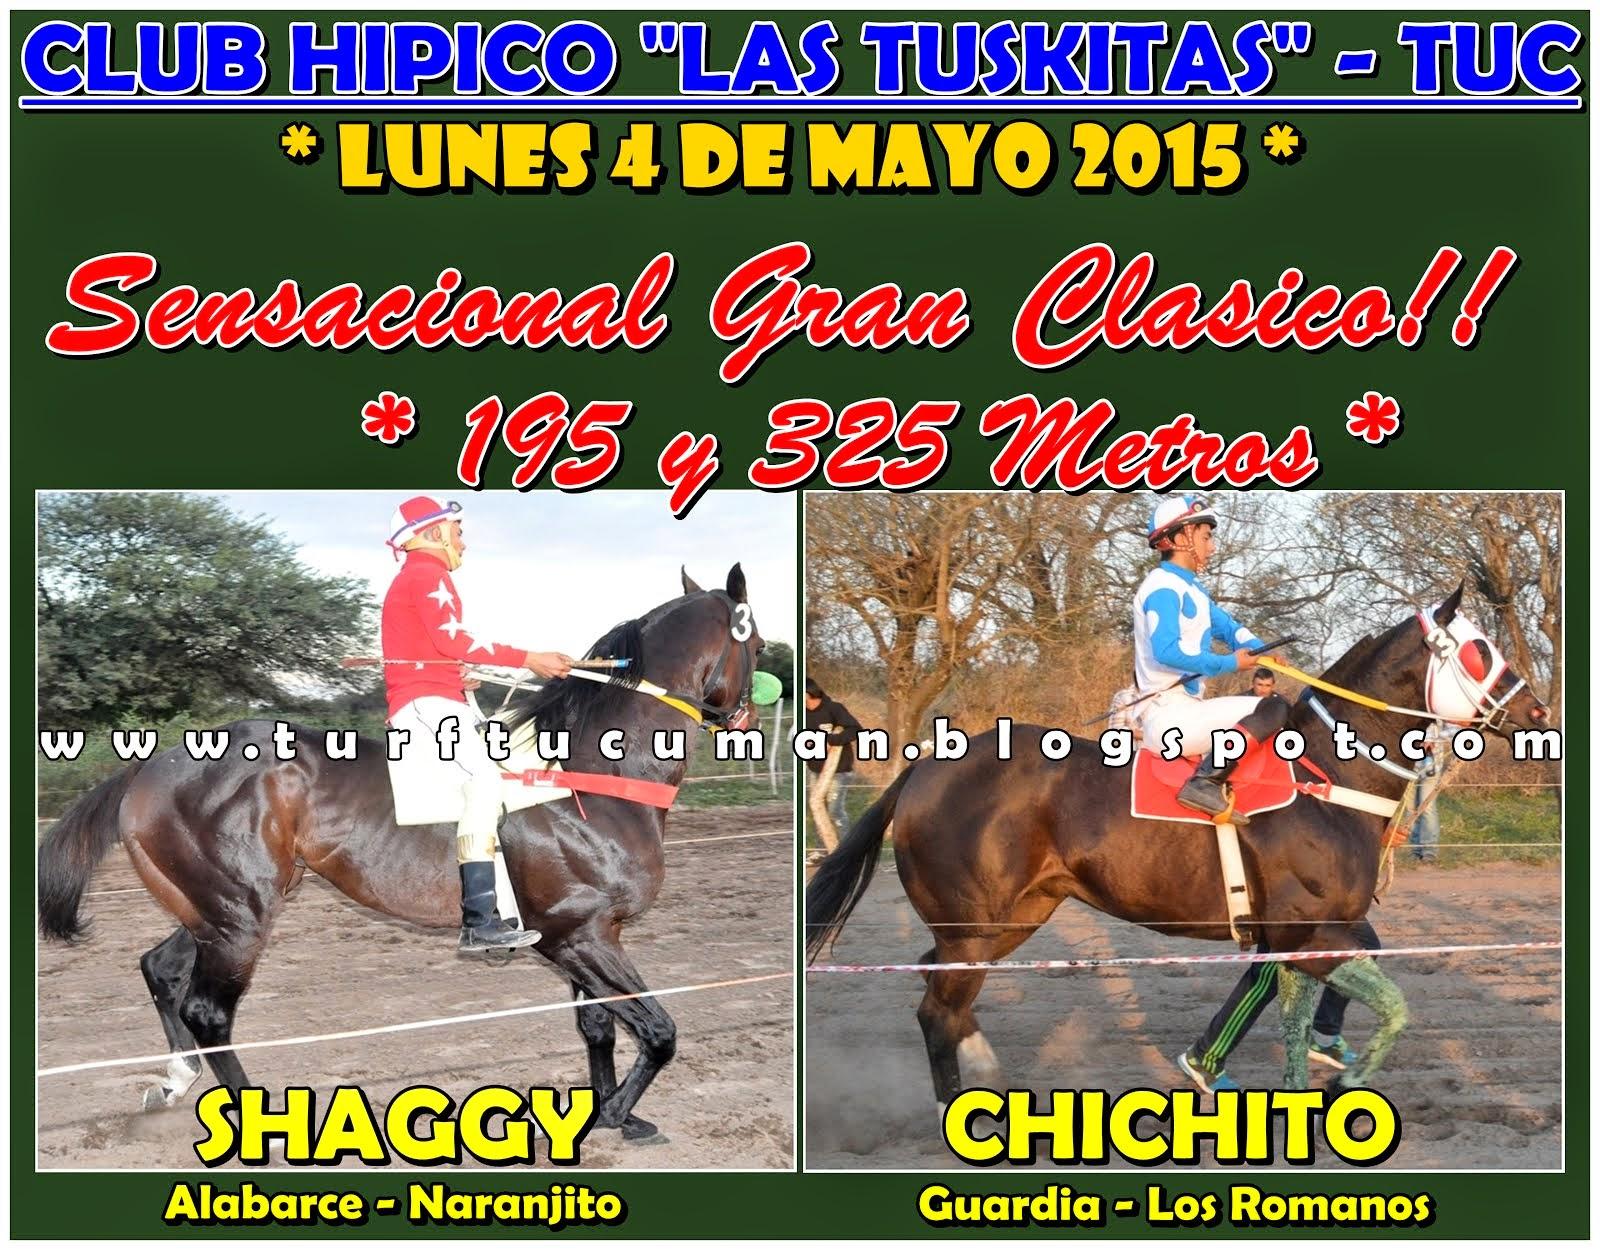 SHAGGY VS CHICHITO